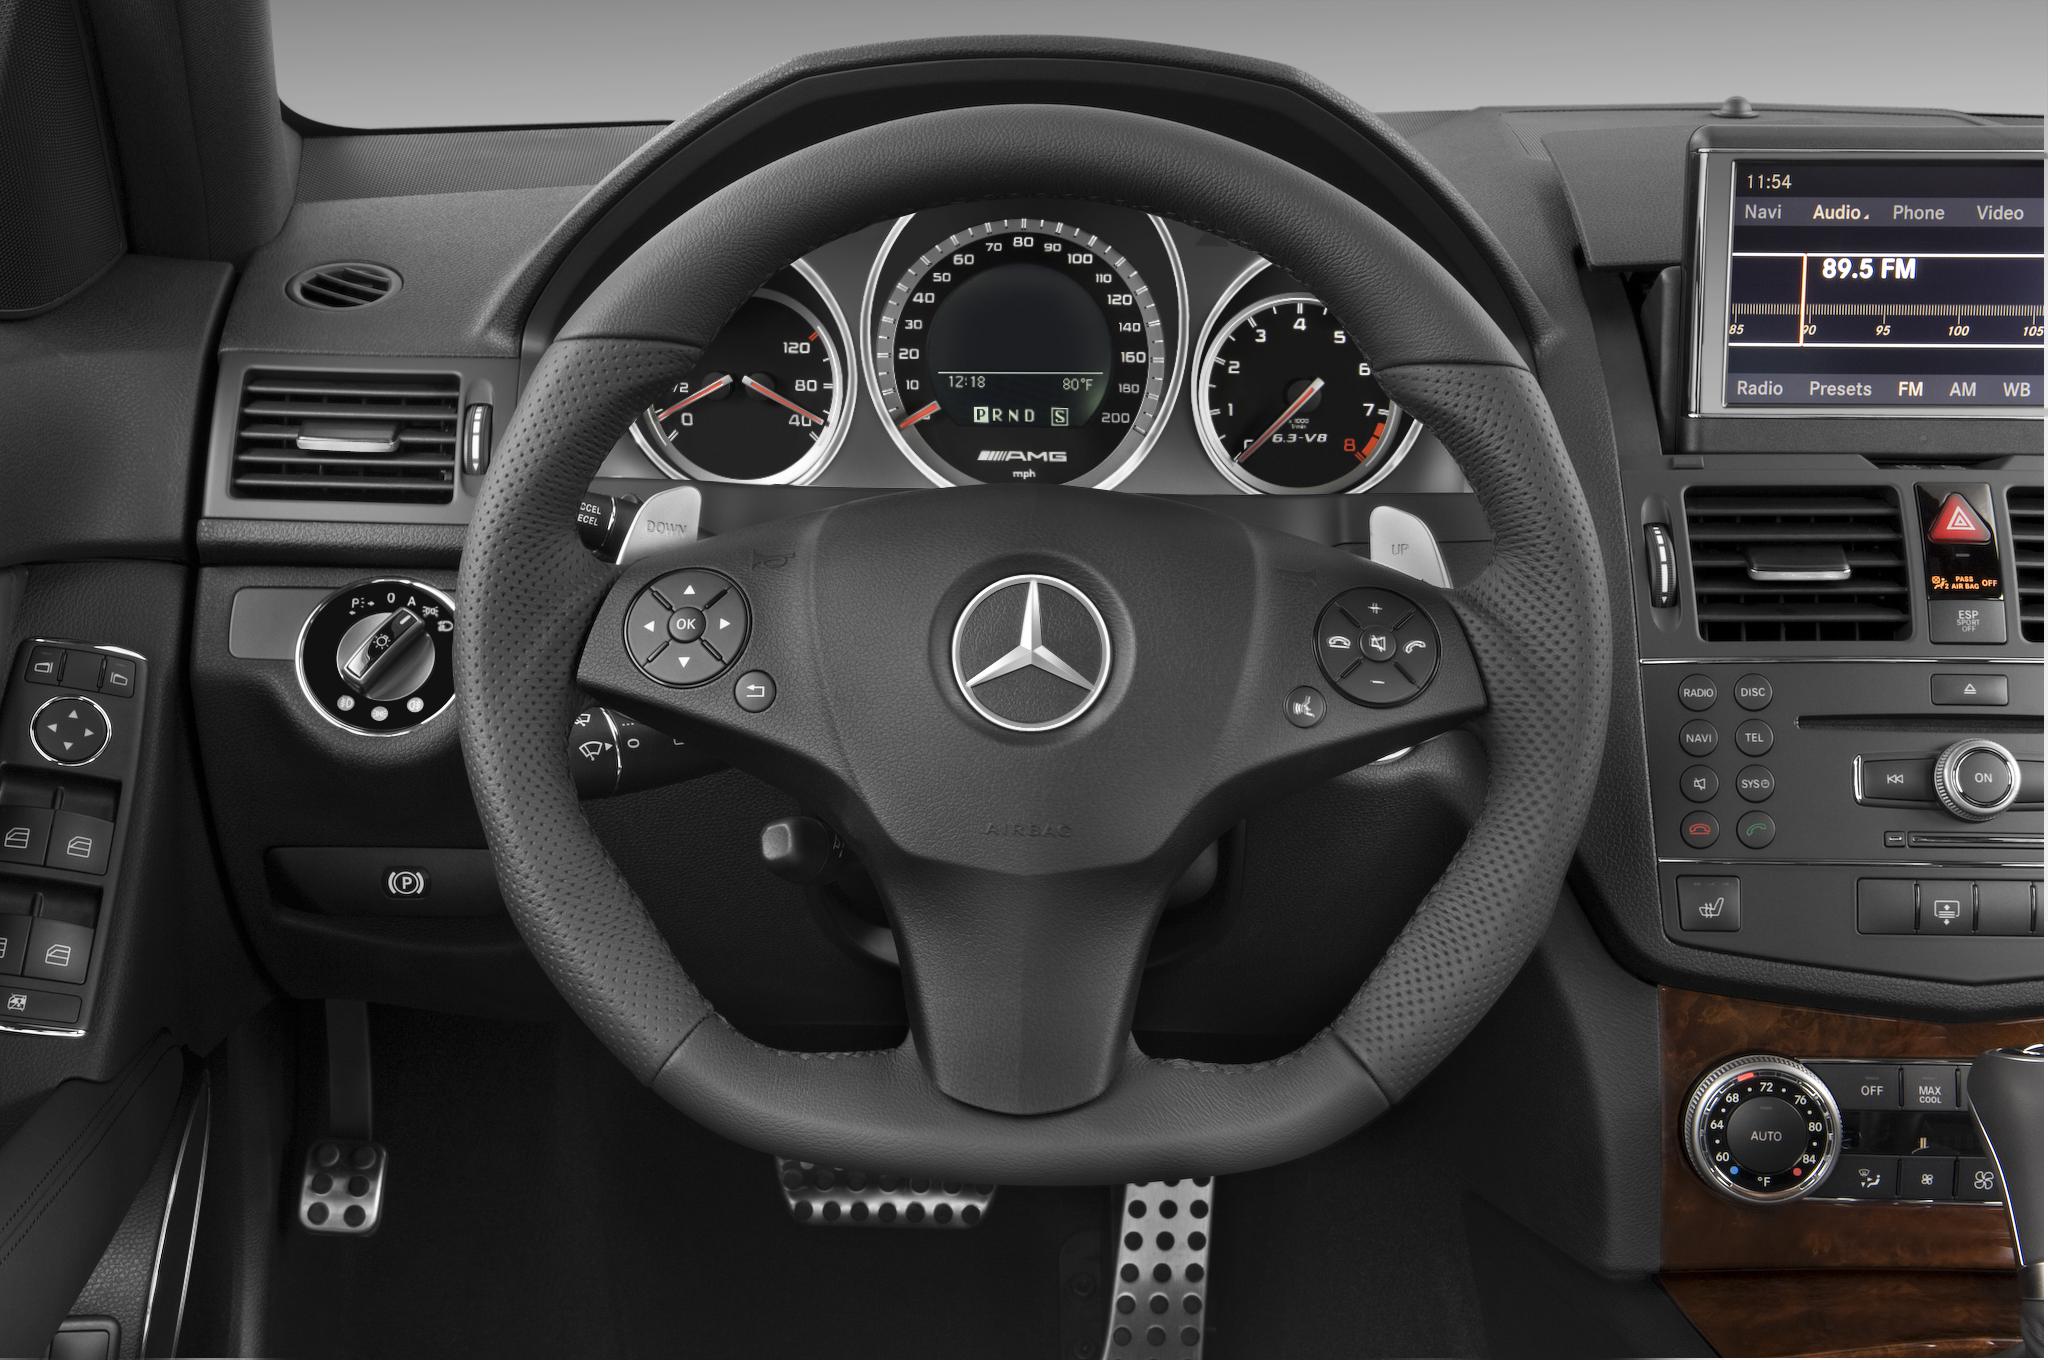 2010 Mercedes-Benz C63 AMG - Automobile Magazine